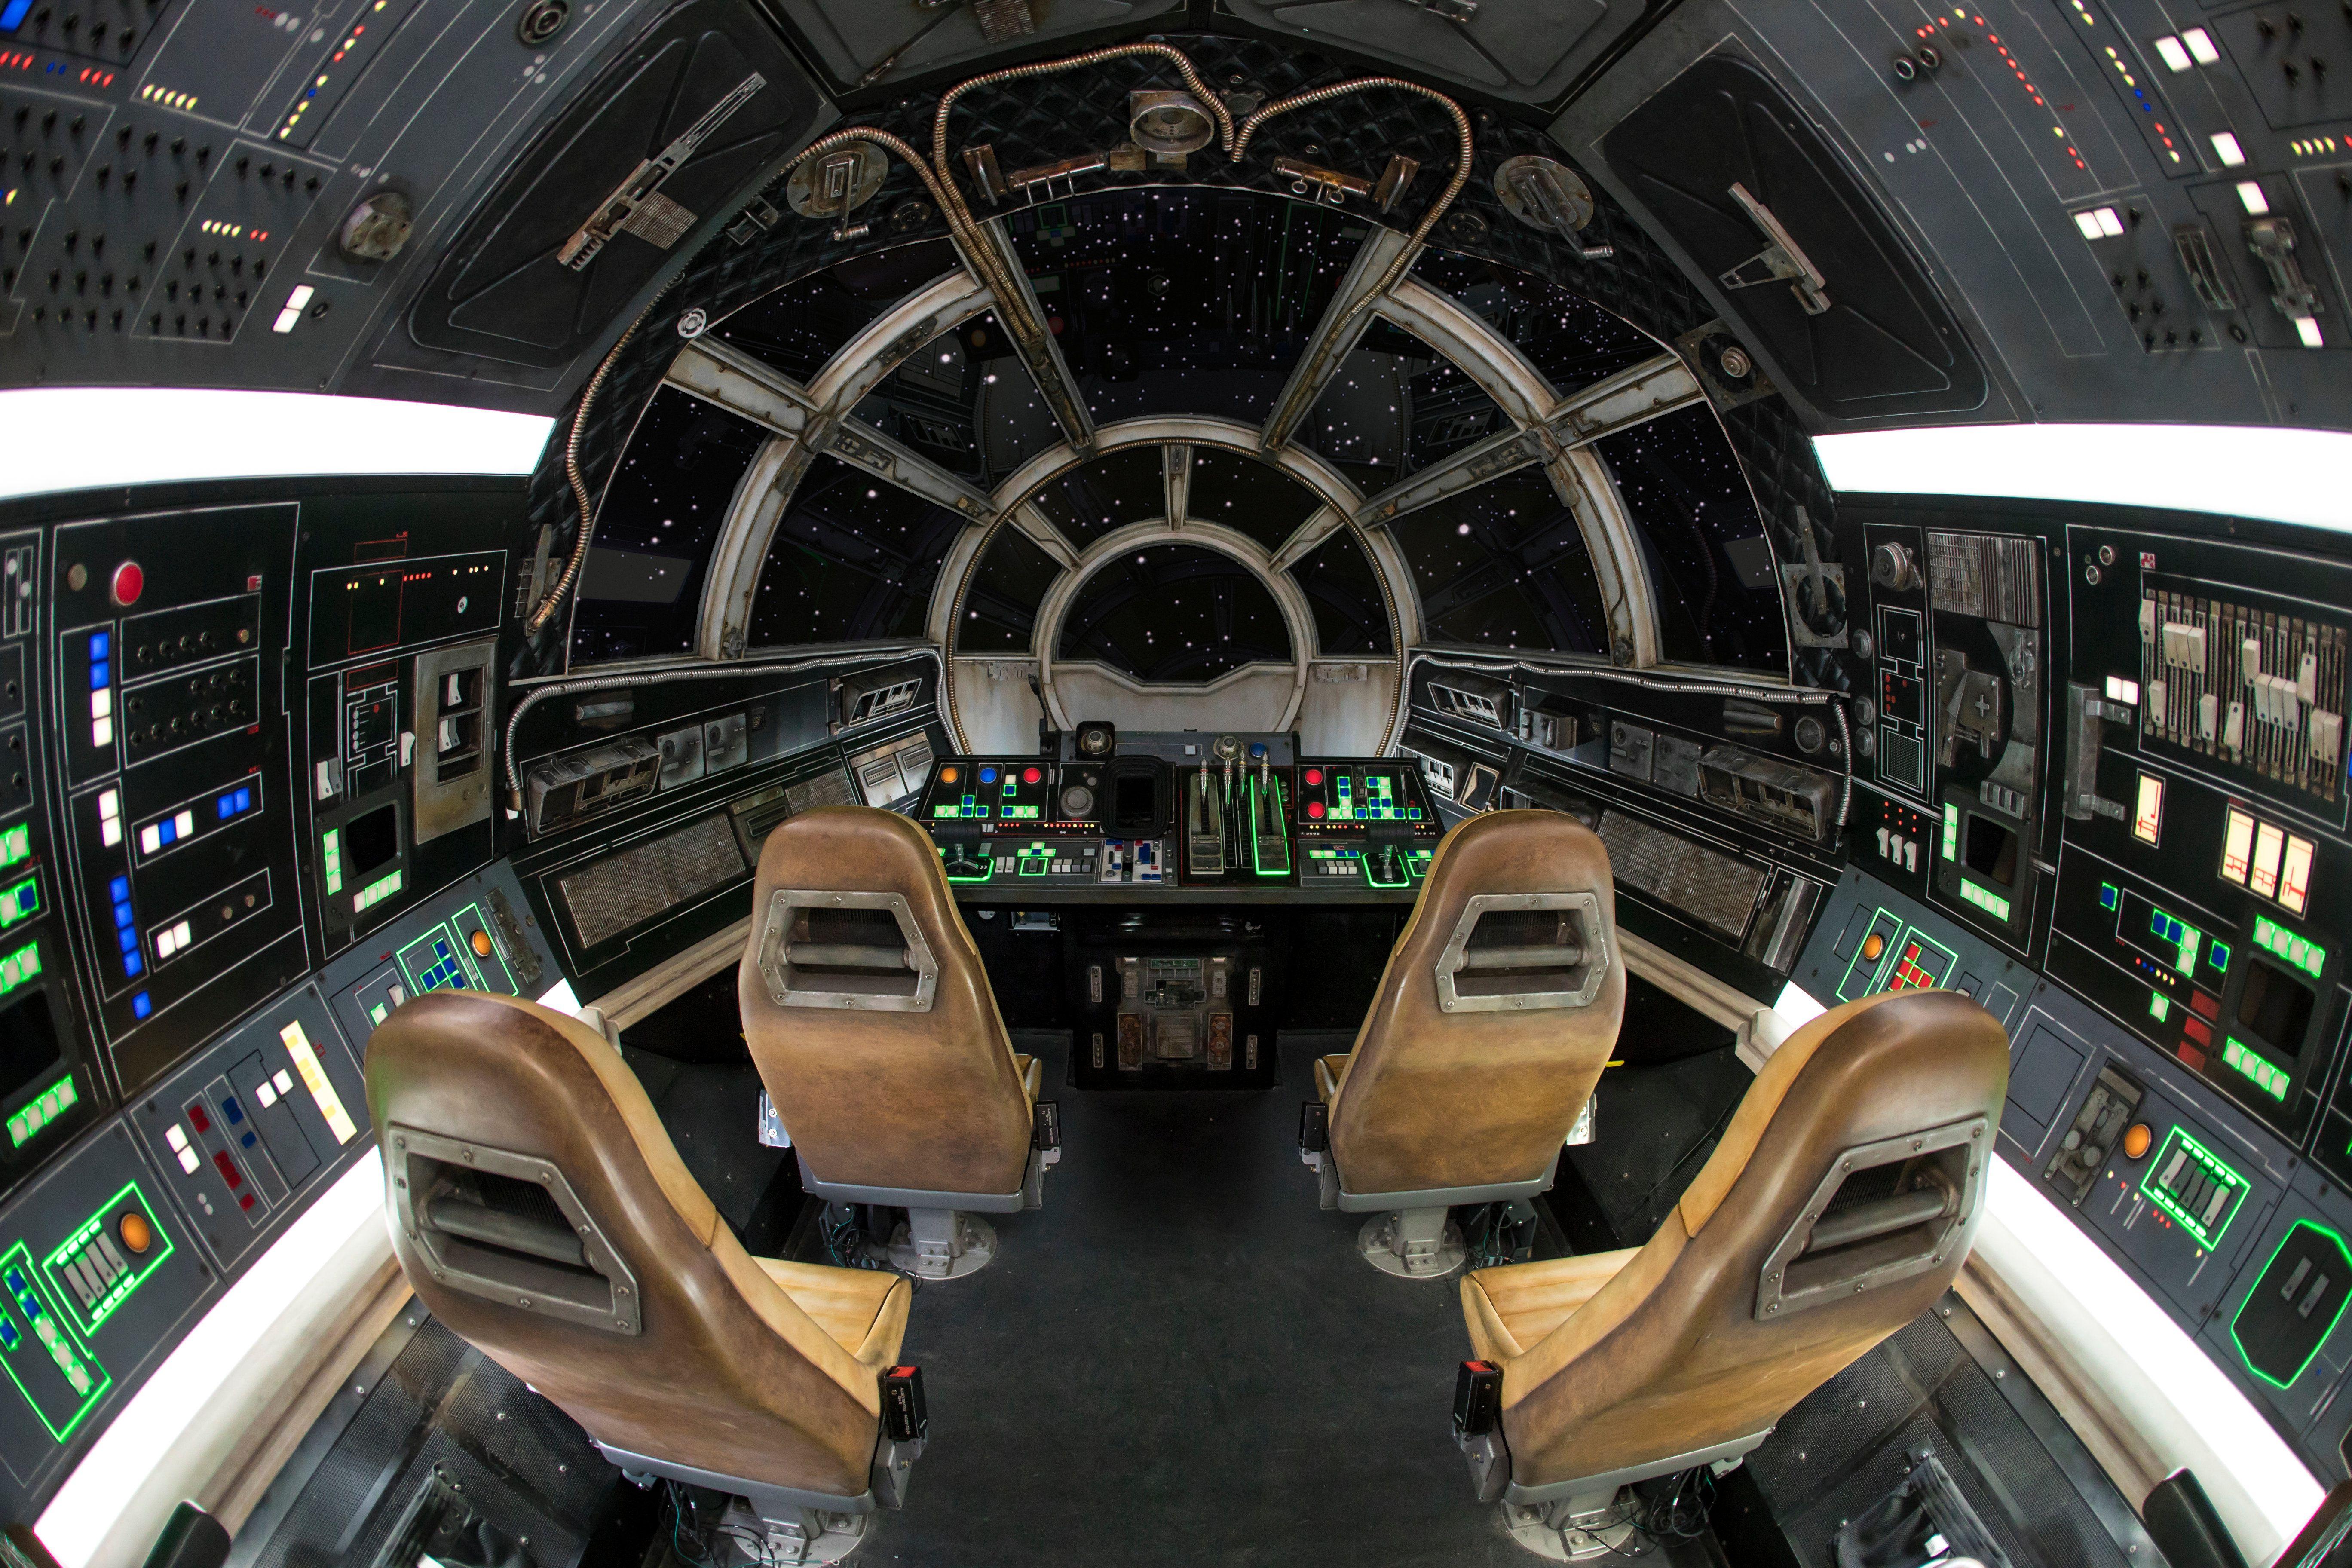 Interior view of Milllennium Falcon: Smuggler's Run at Disneyland showing seating and controls